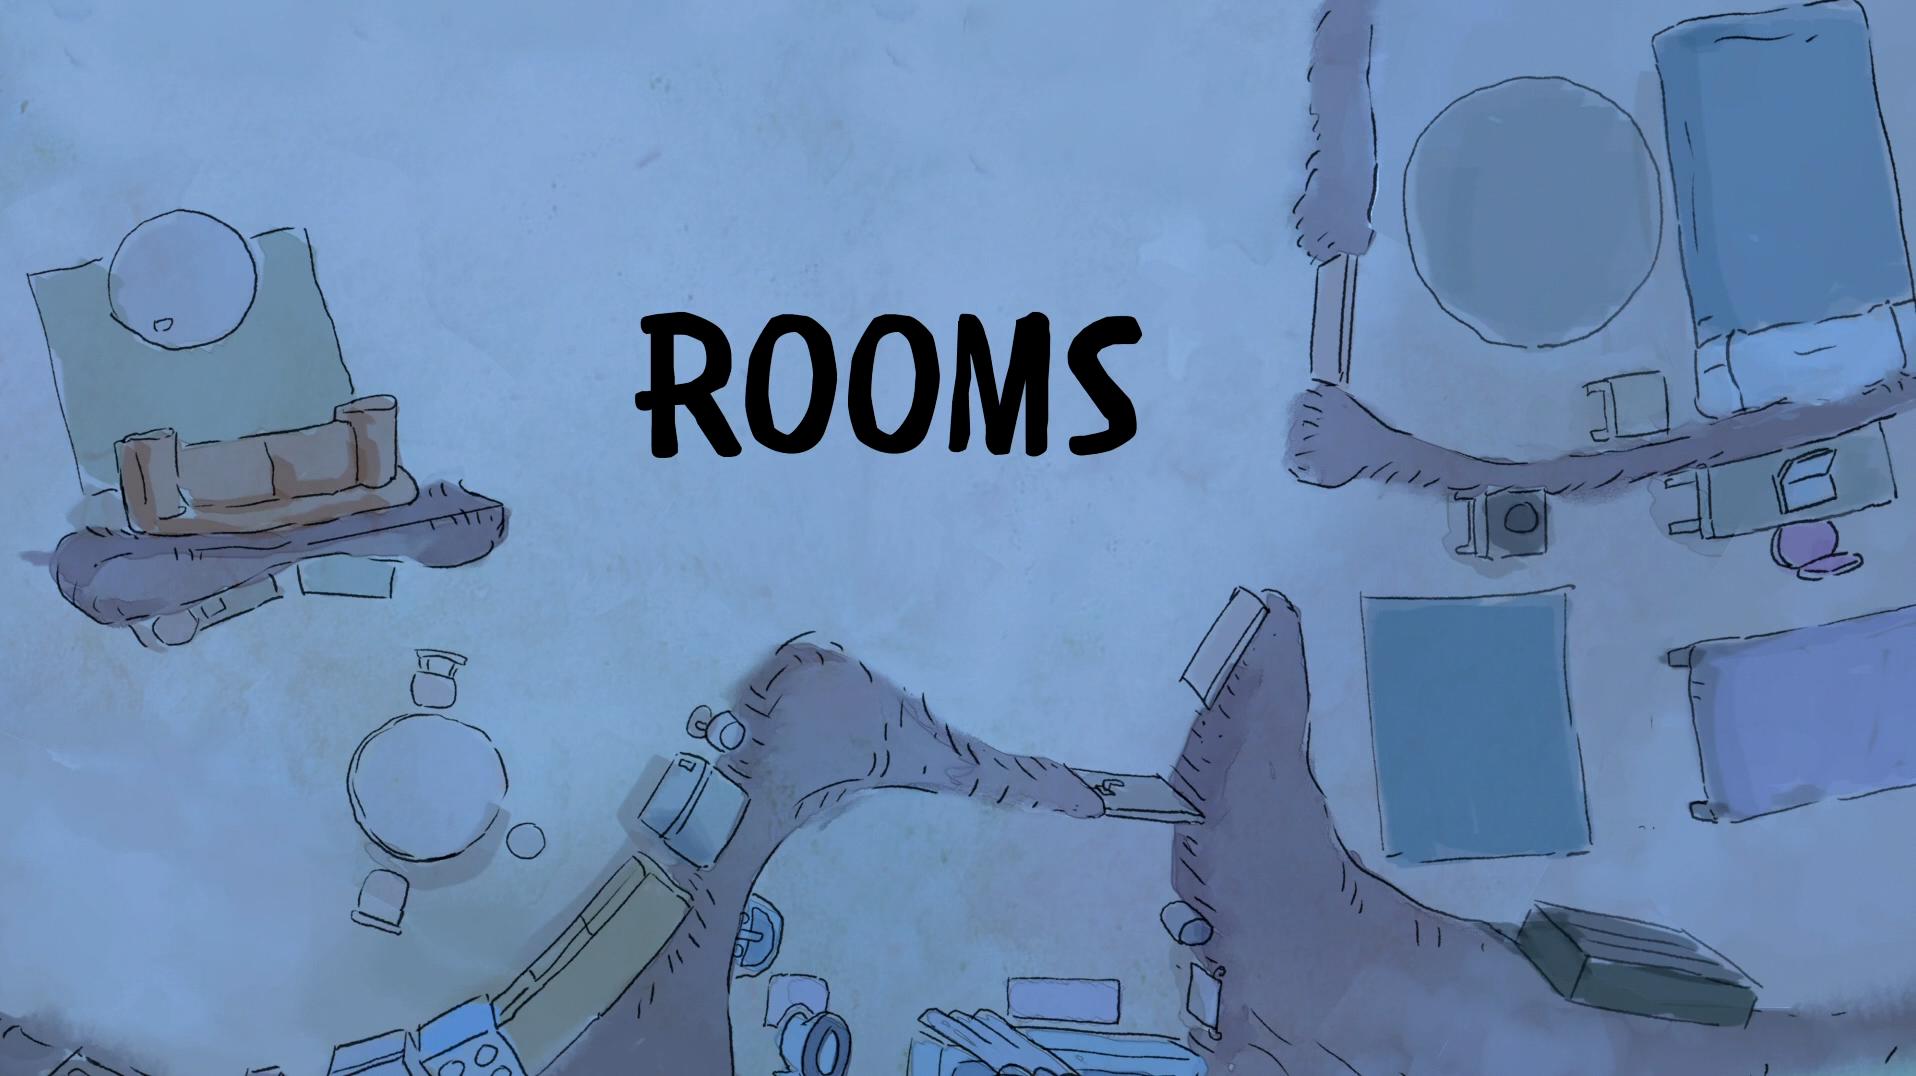 Rooms | We Bare Bears Wiki | FANDOM powered by Wikia